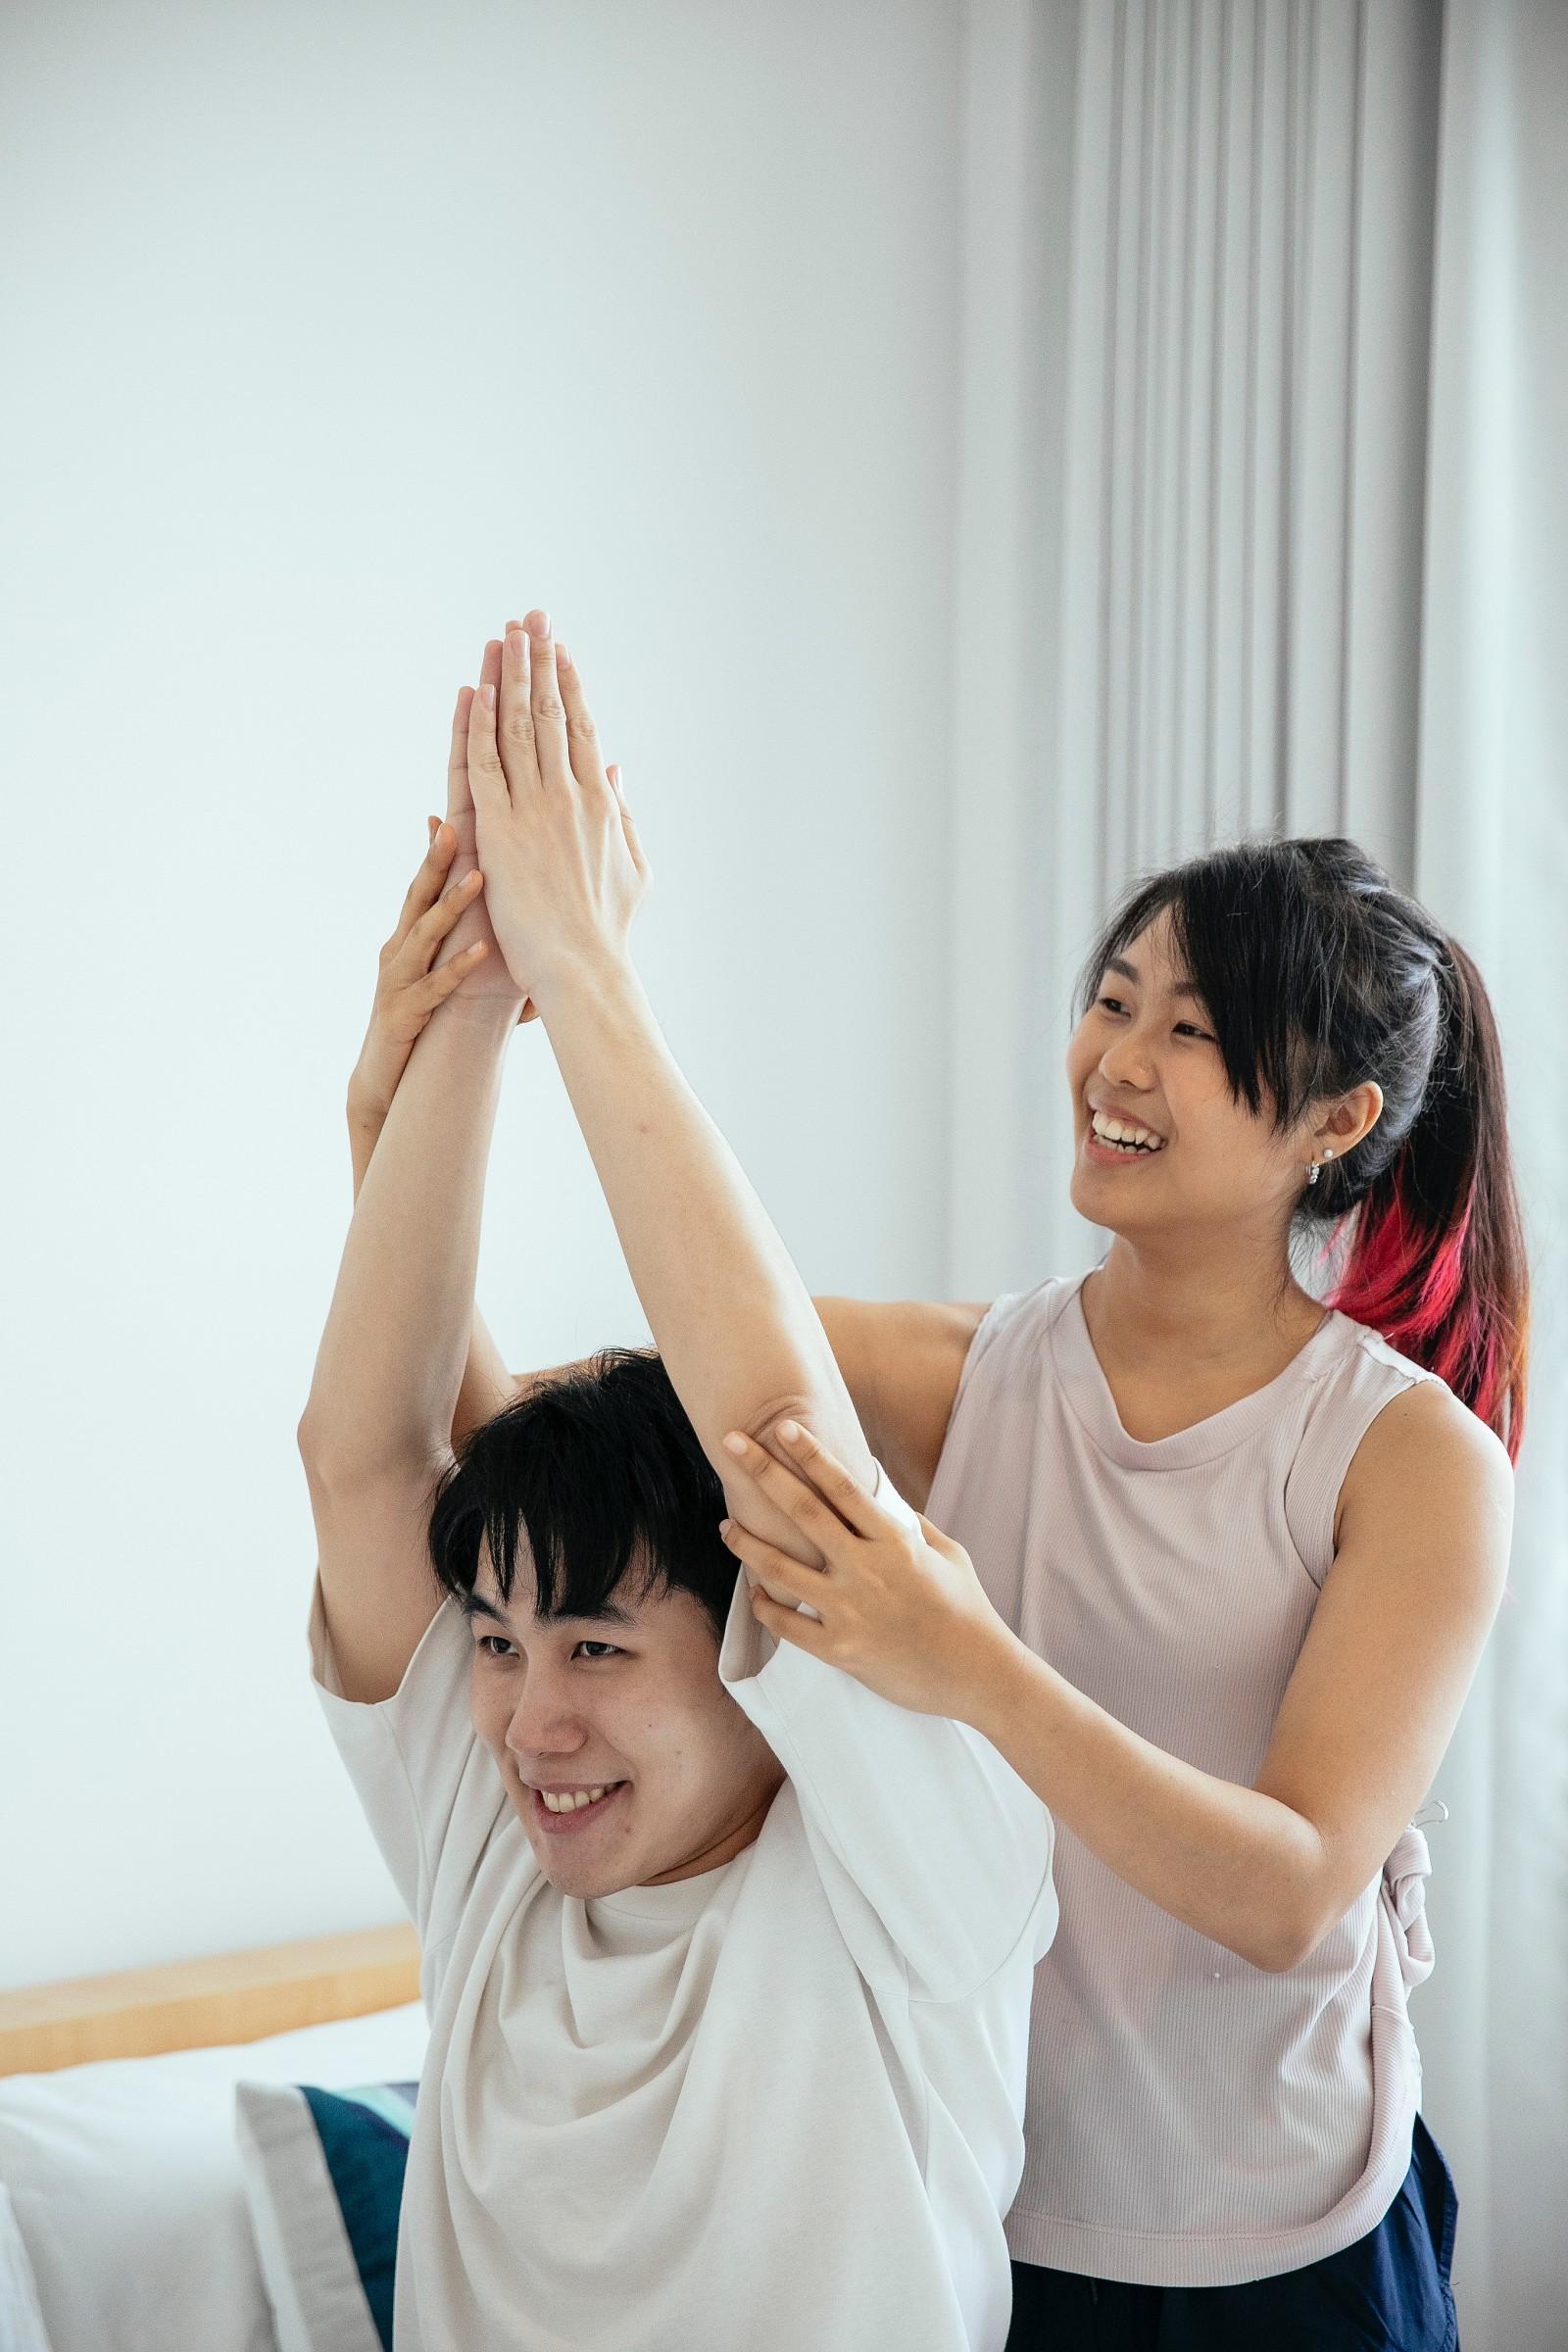 Rehabilitation Therapy in Athletic Training program